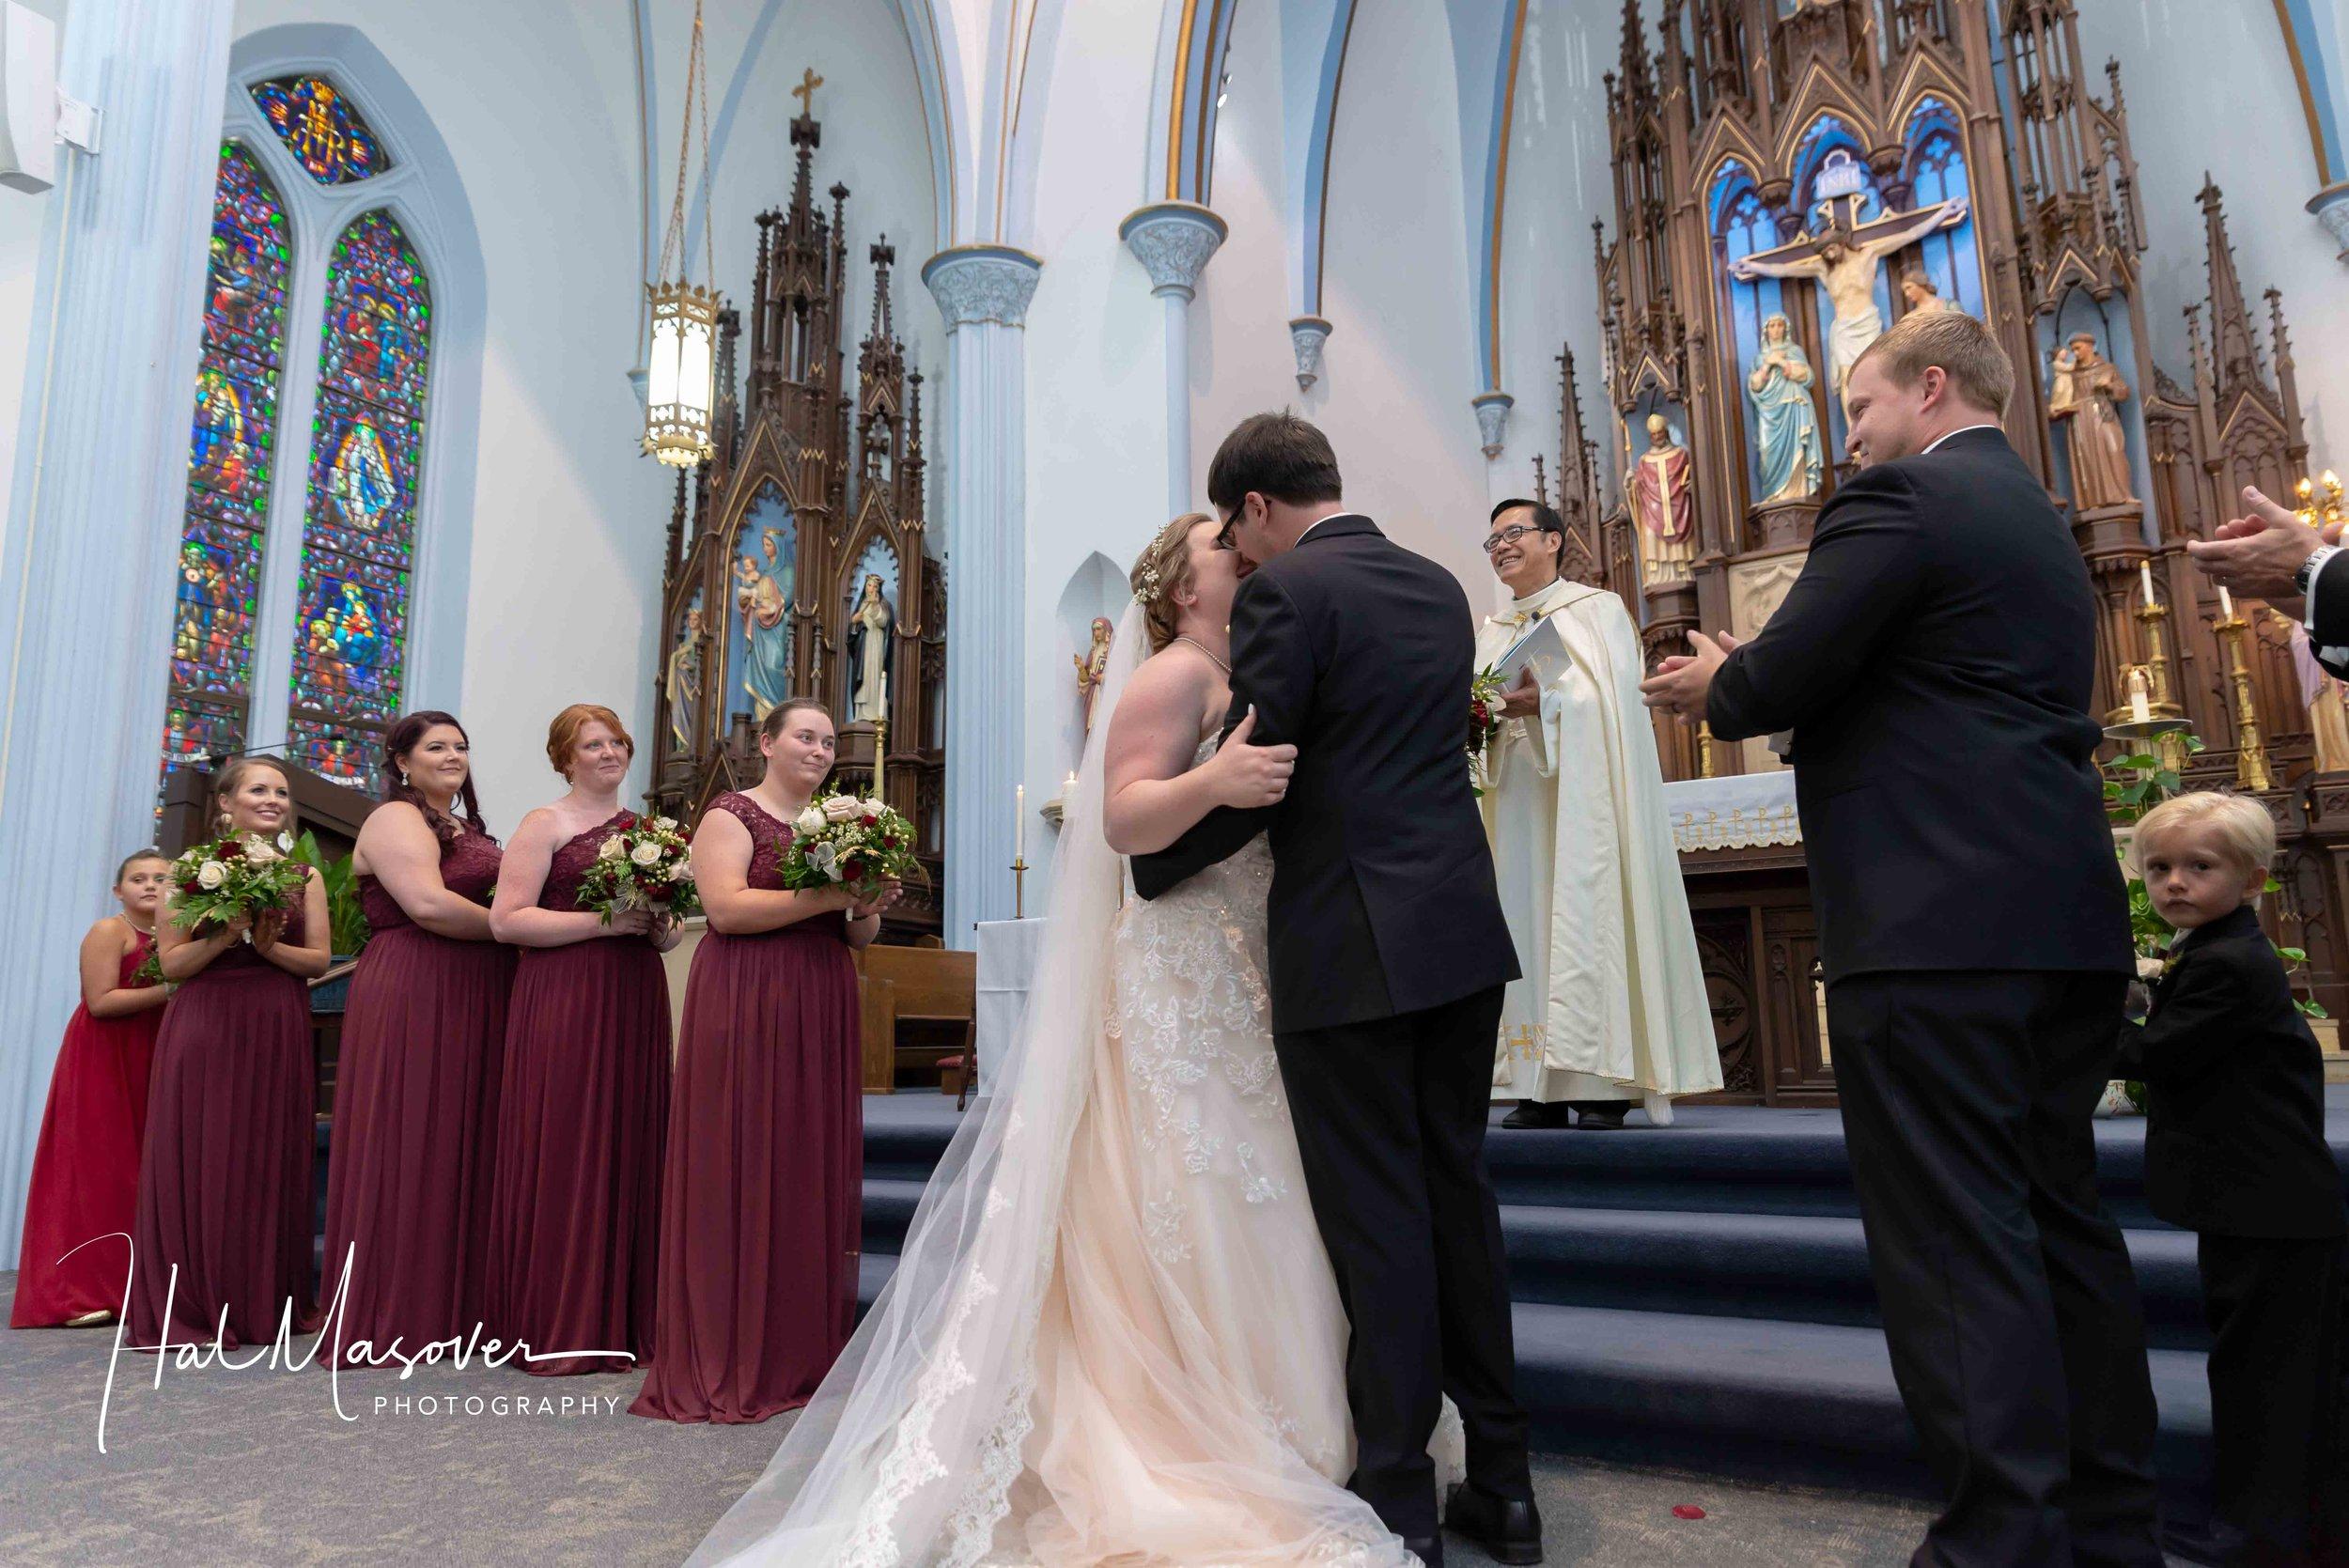 diton wedding Hal Masover Photography.jpg